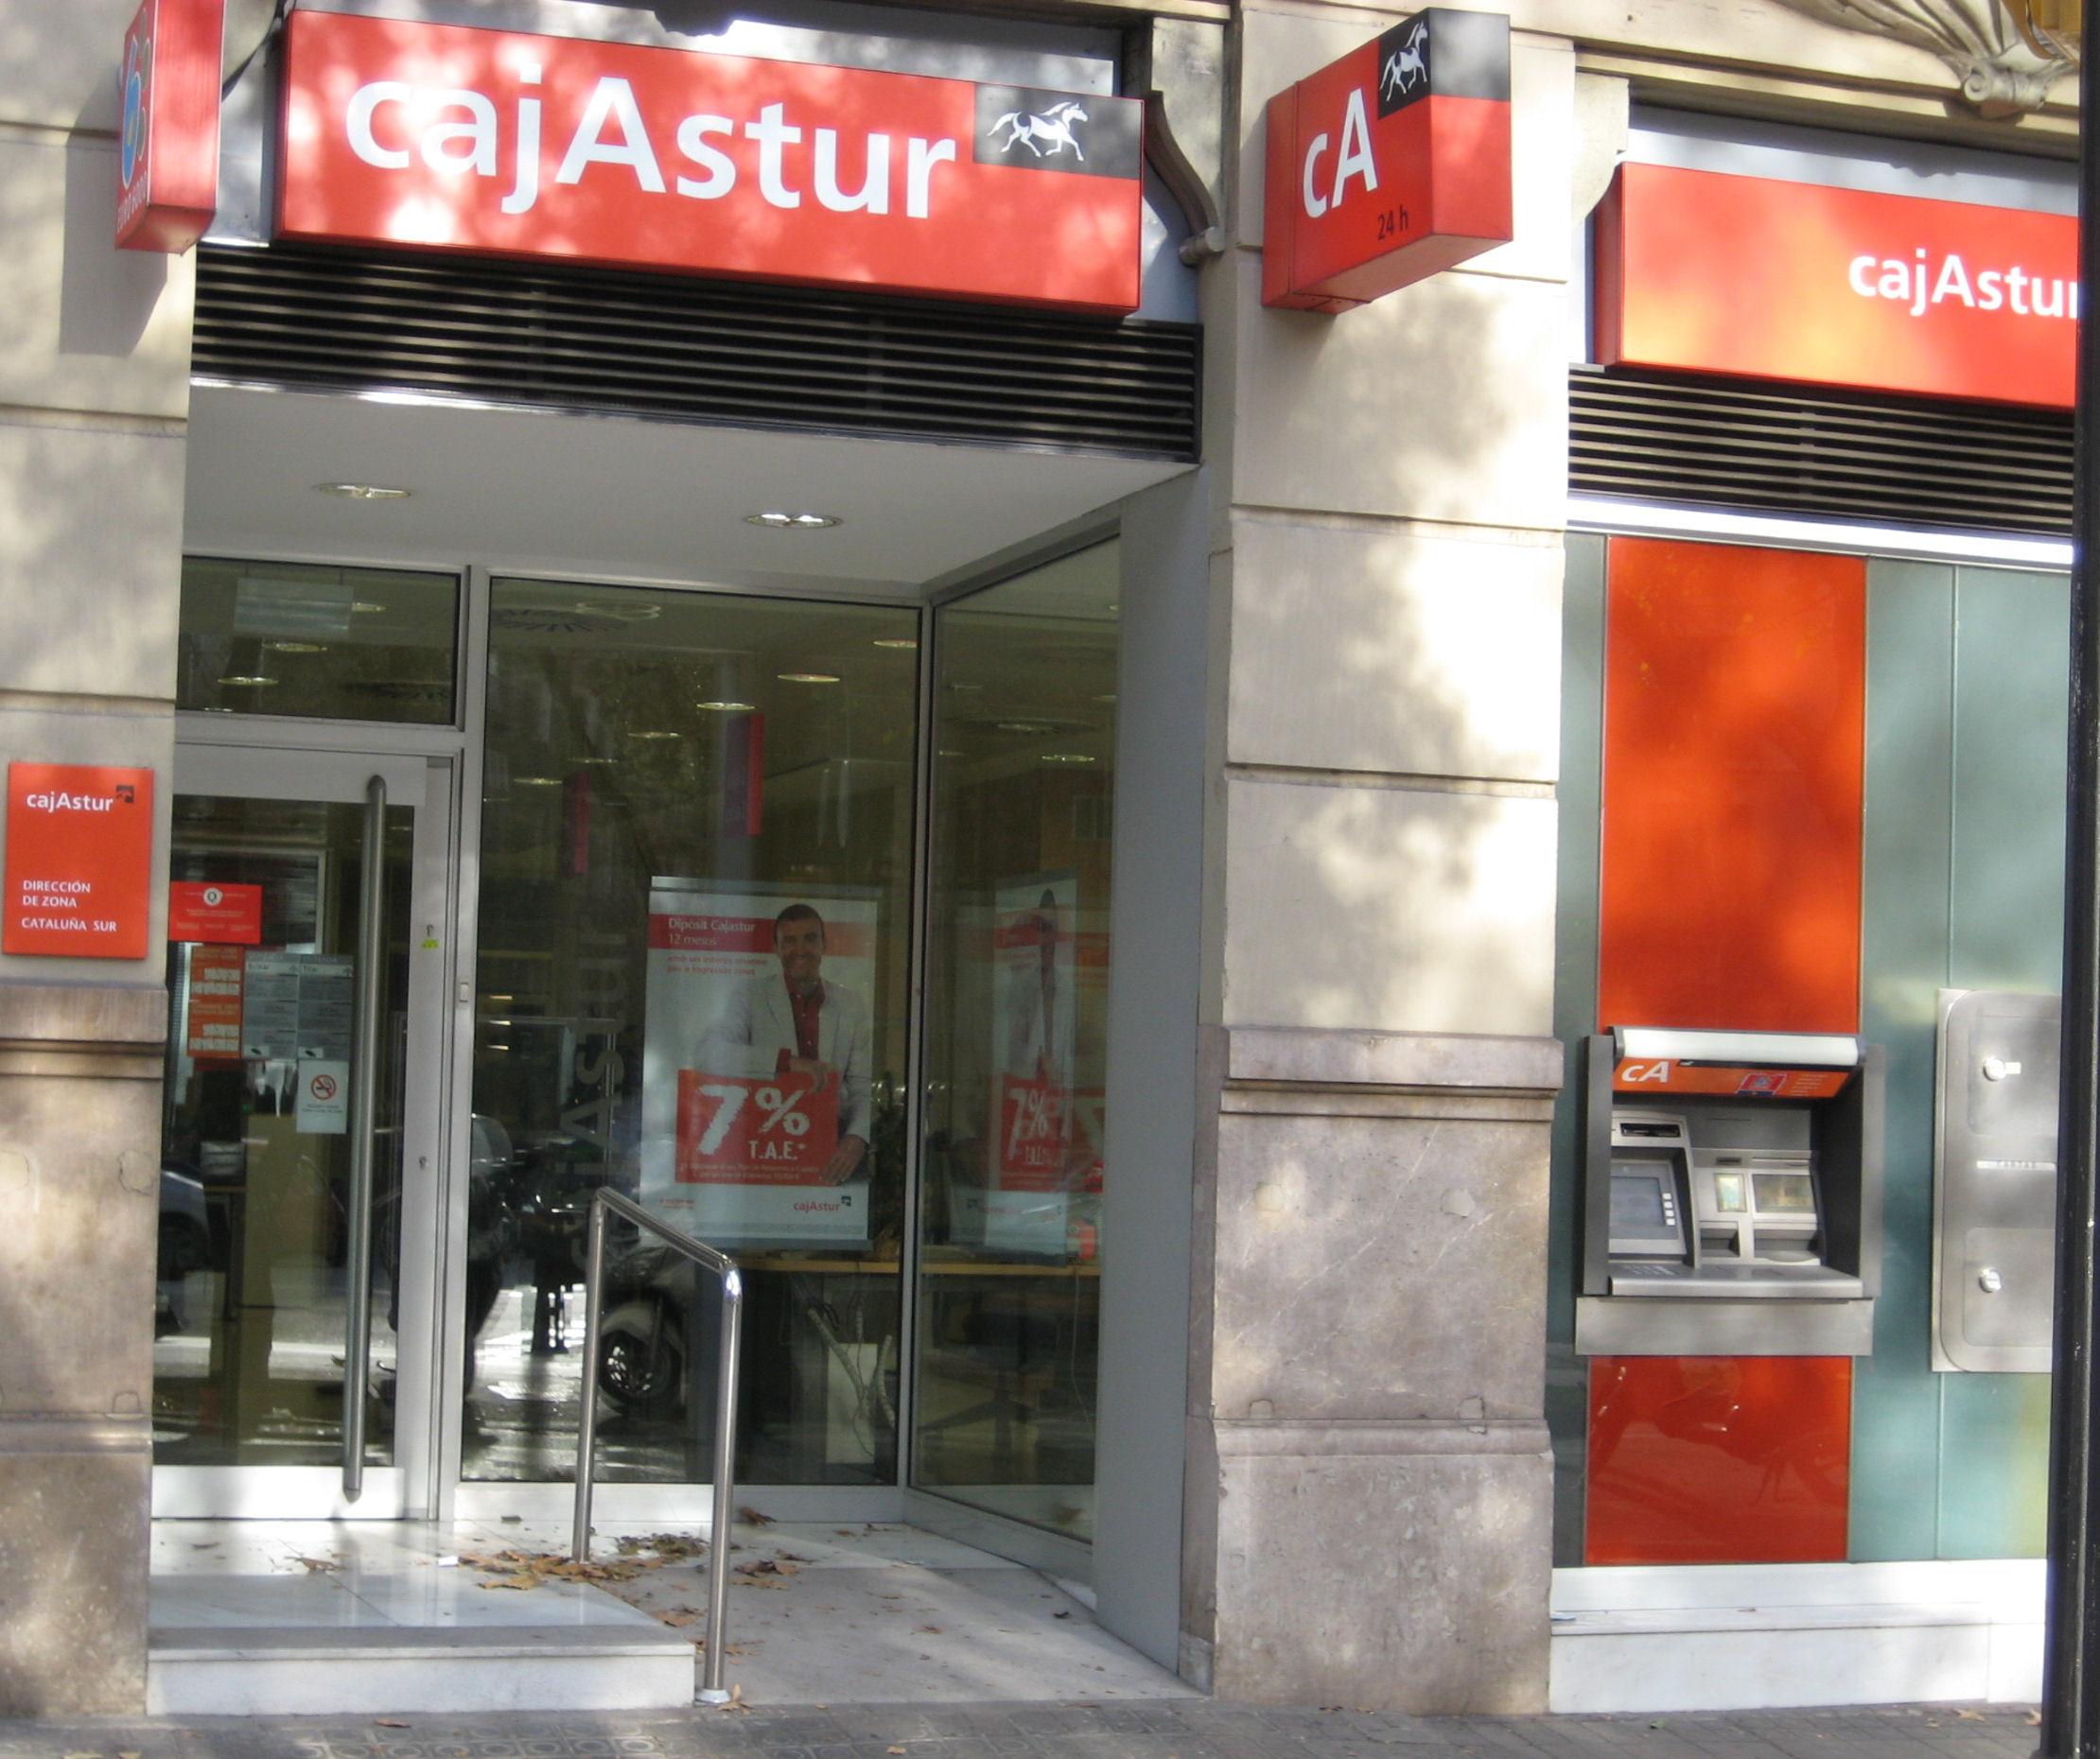 Casa de asturias en valencia casa d 39 asturies en valencia for Oficinas liberbank valencia